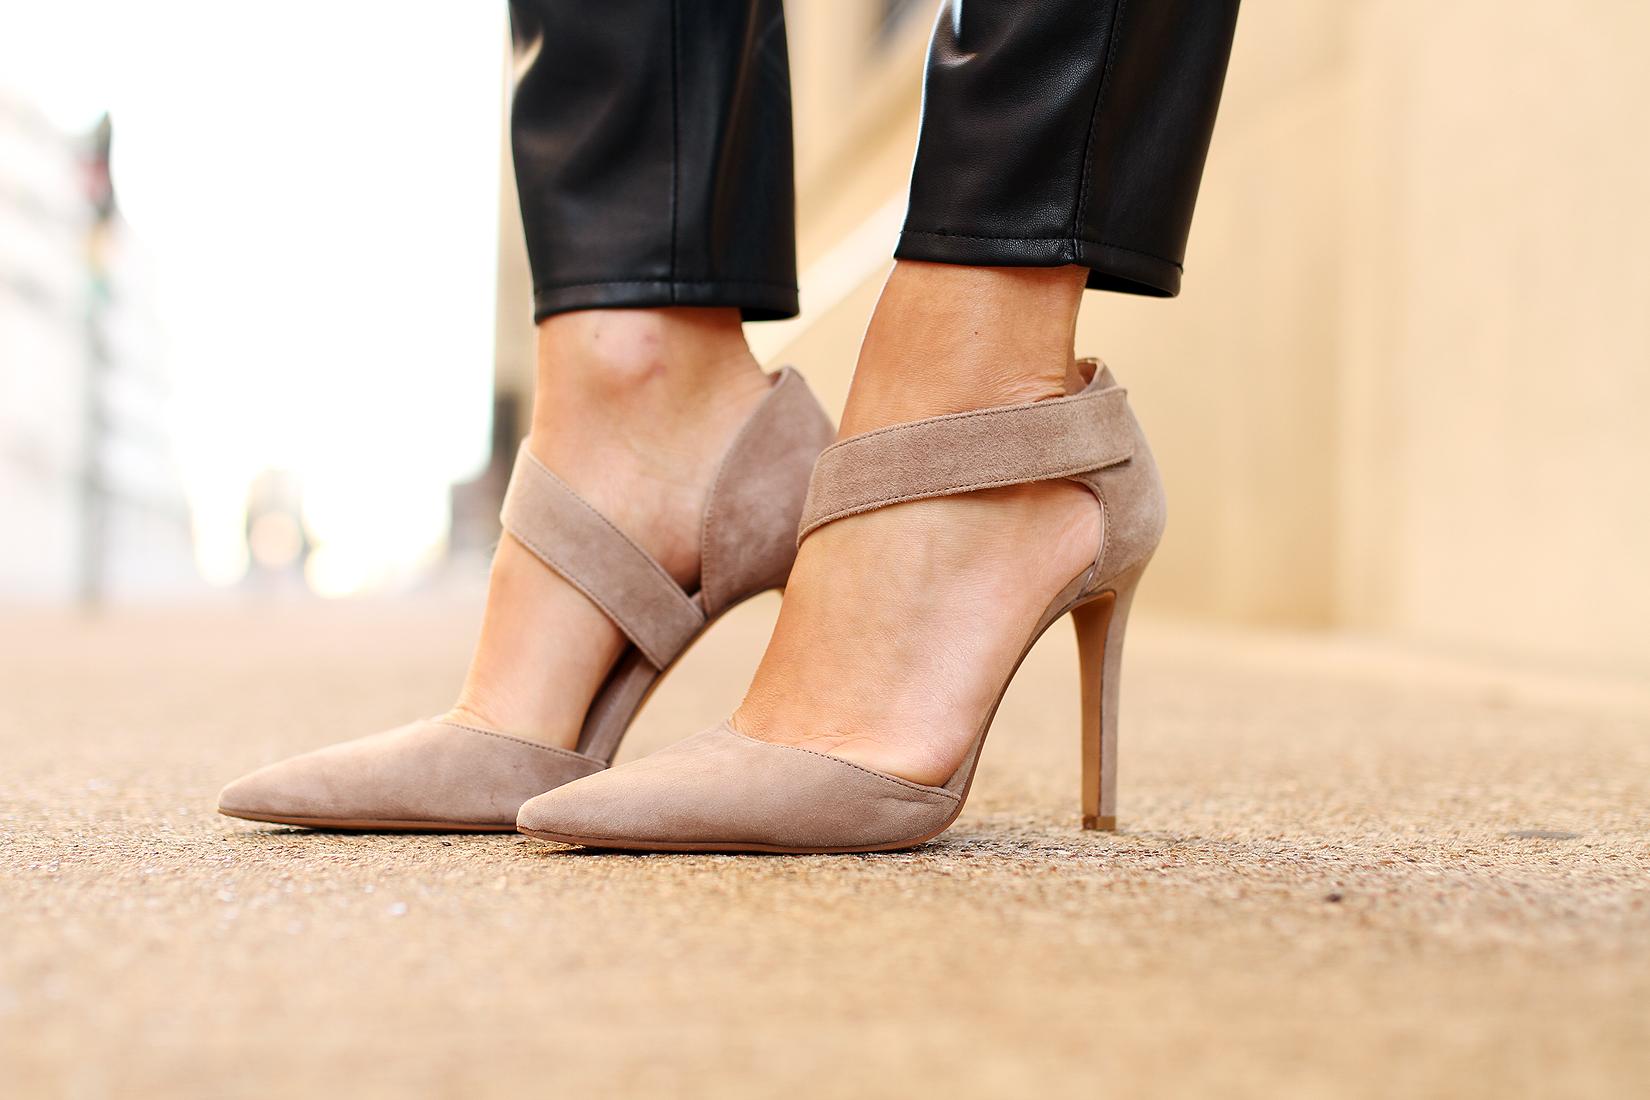 fashion-jackson-vince-camuto-carlotte-pumps